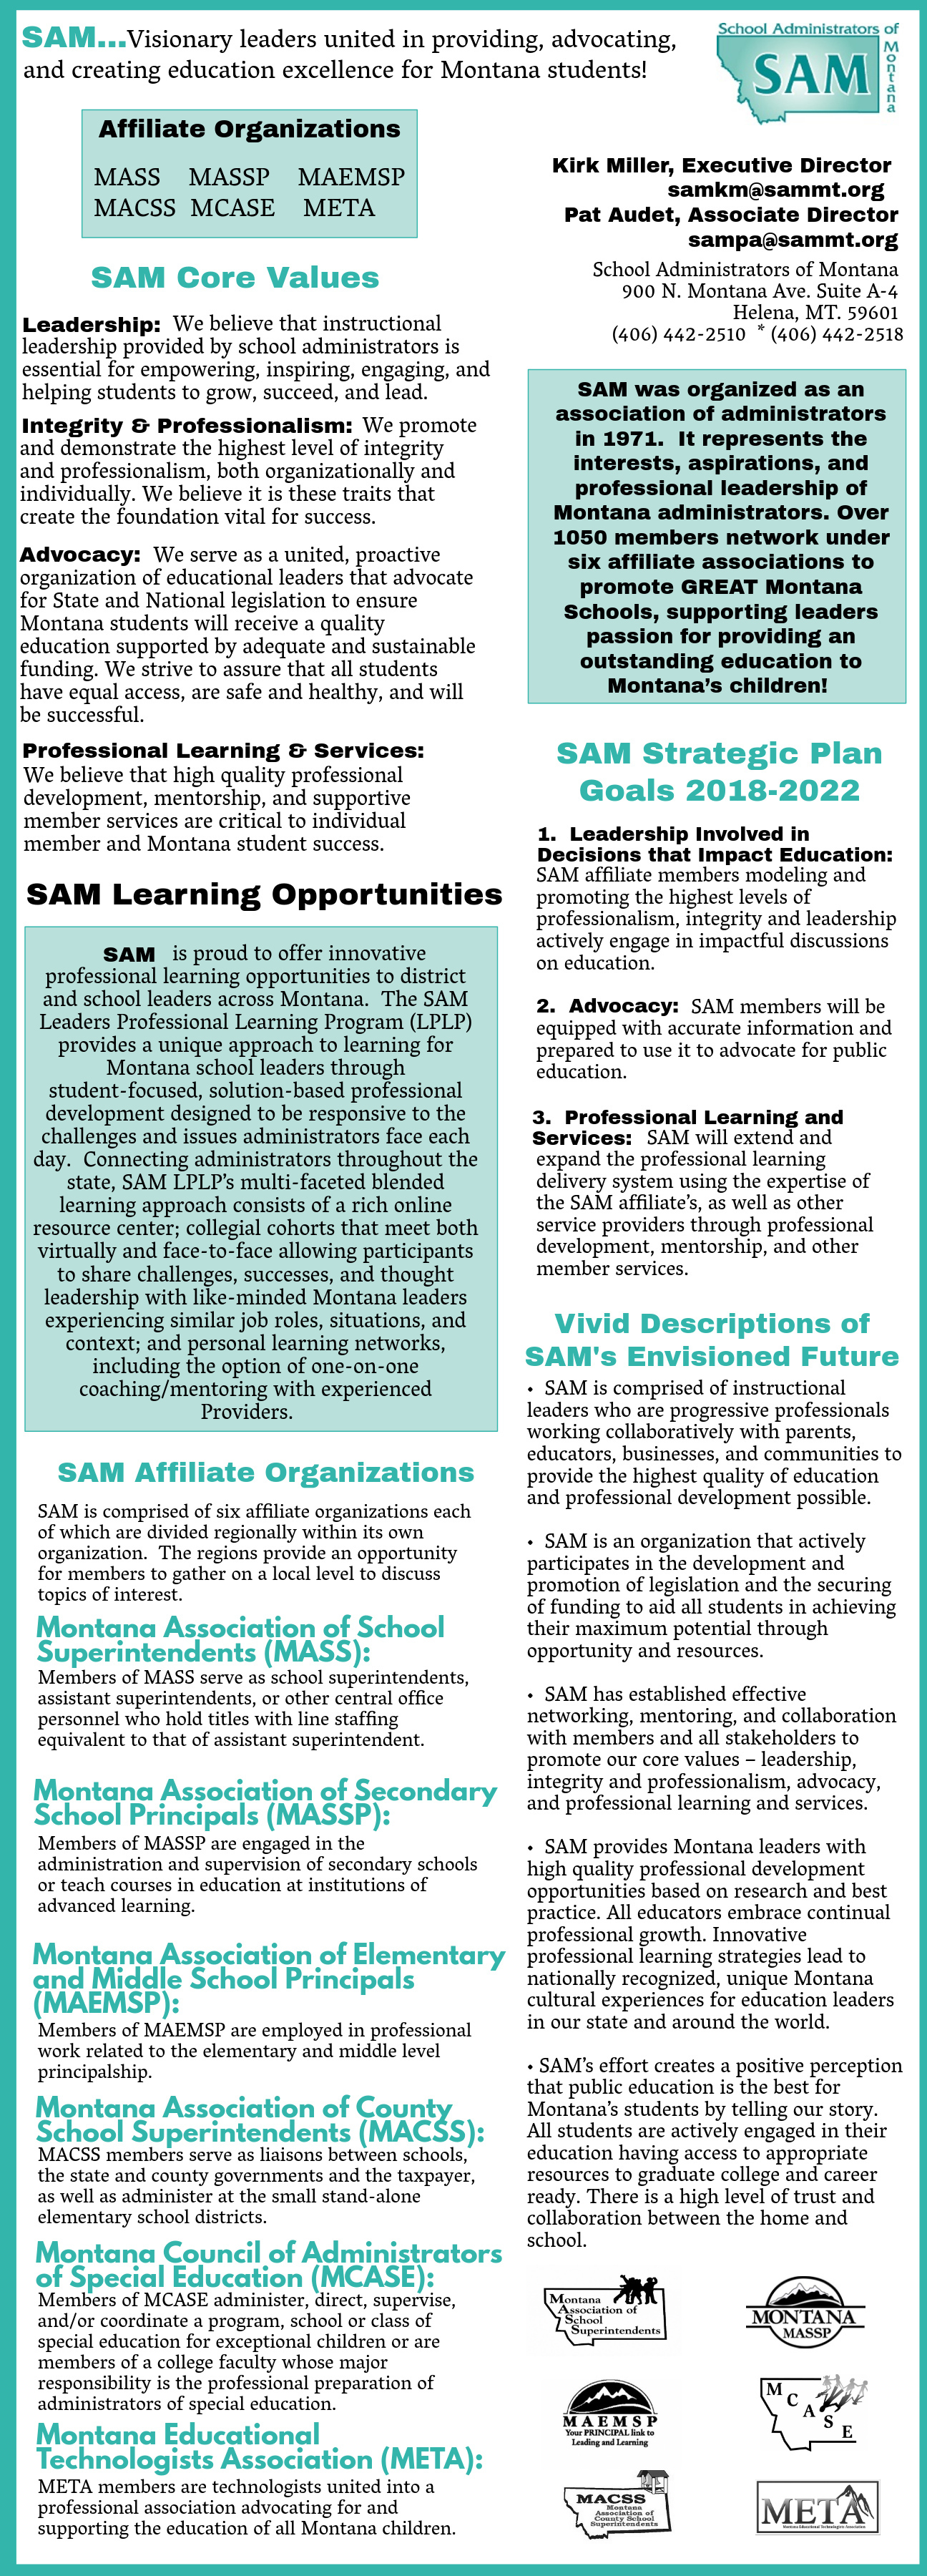 SAM_OnePage_Infographic.jpg - 2.15 Mb